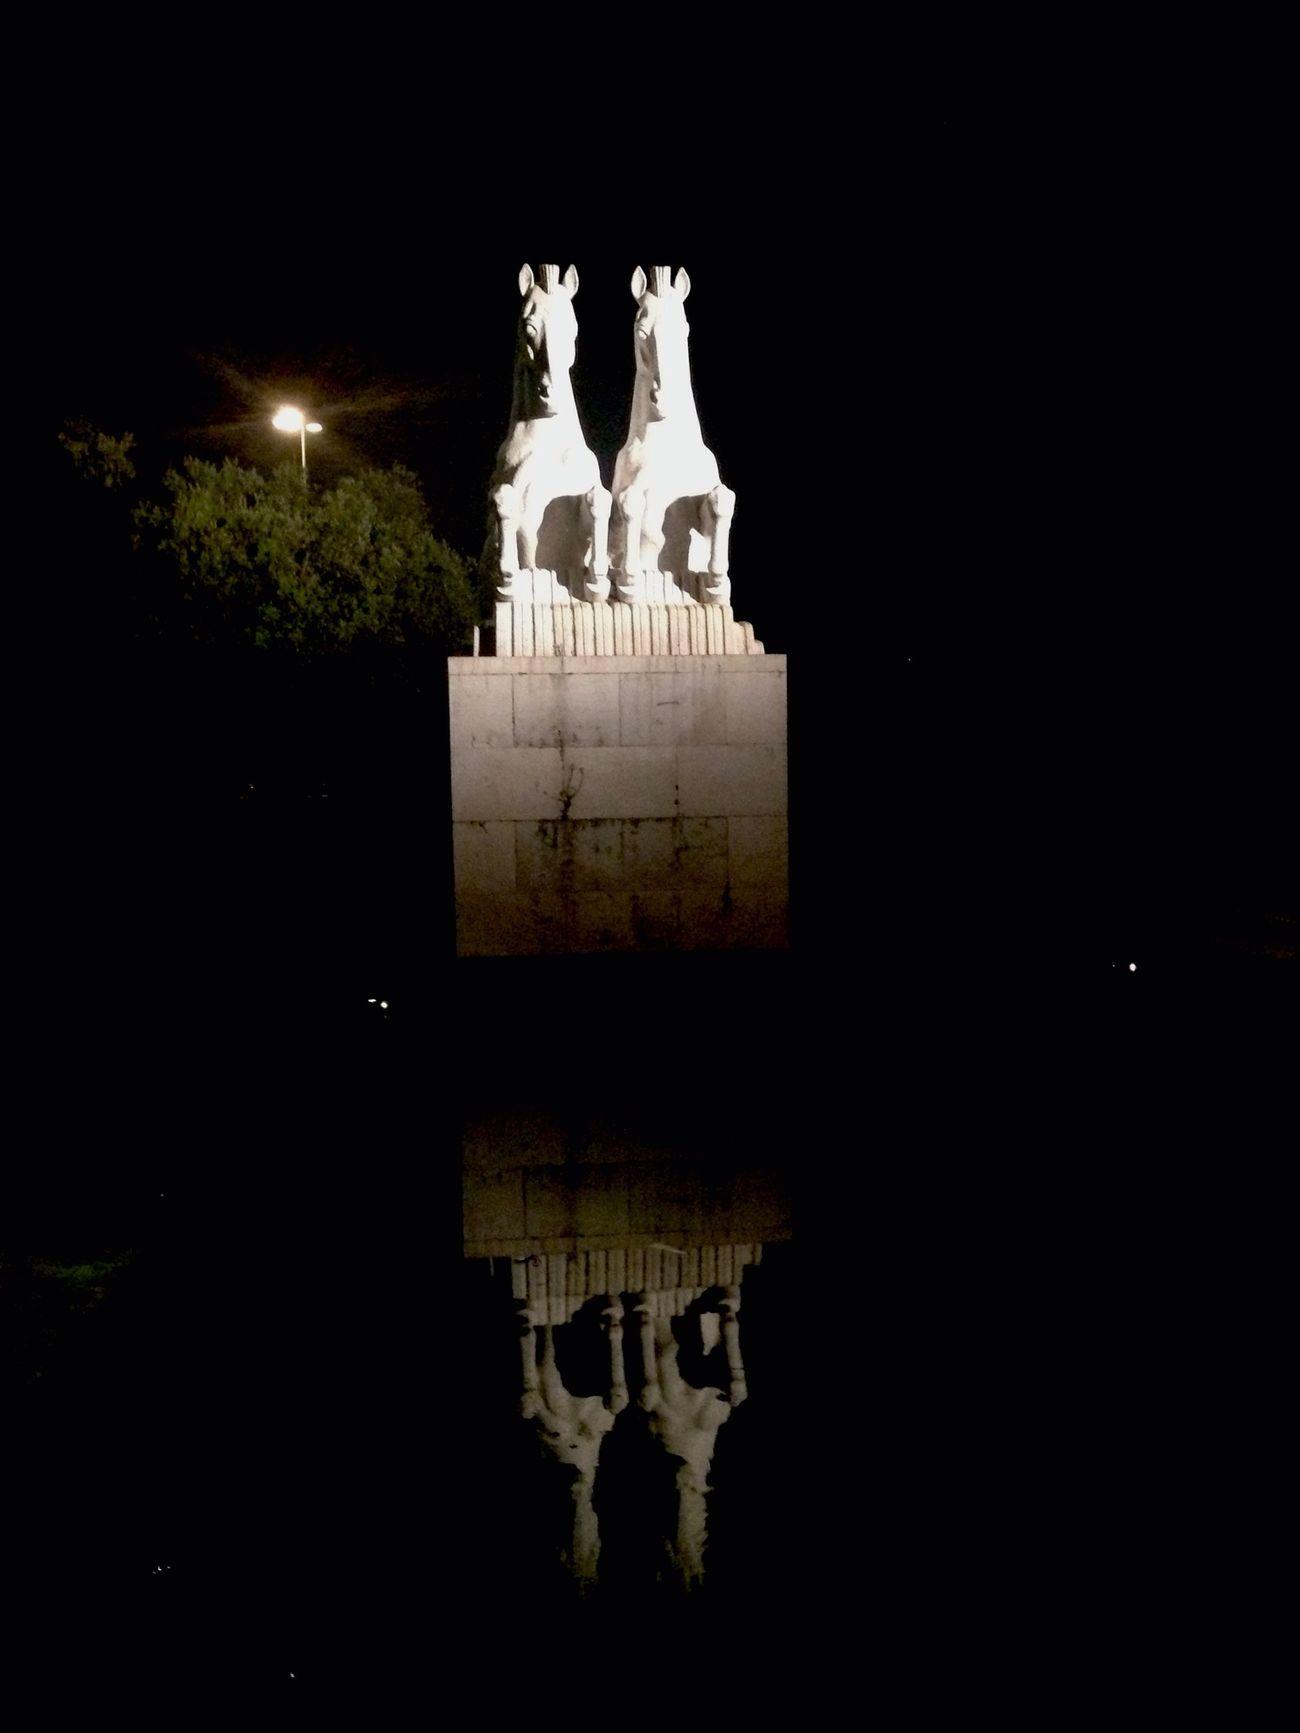 Night Statue Horses Reflection Park Lake